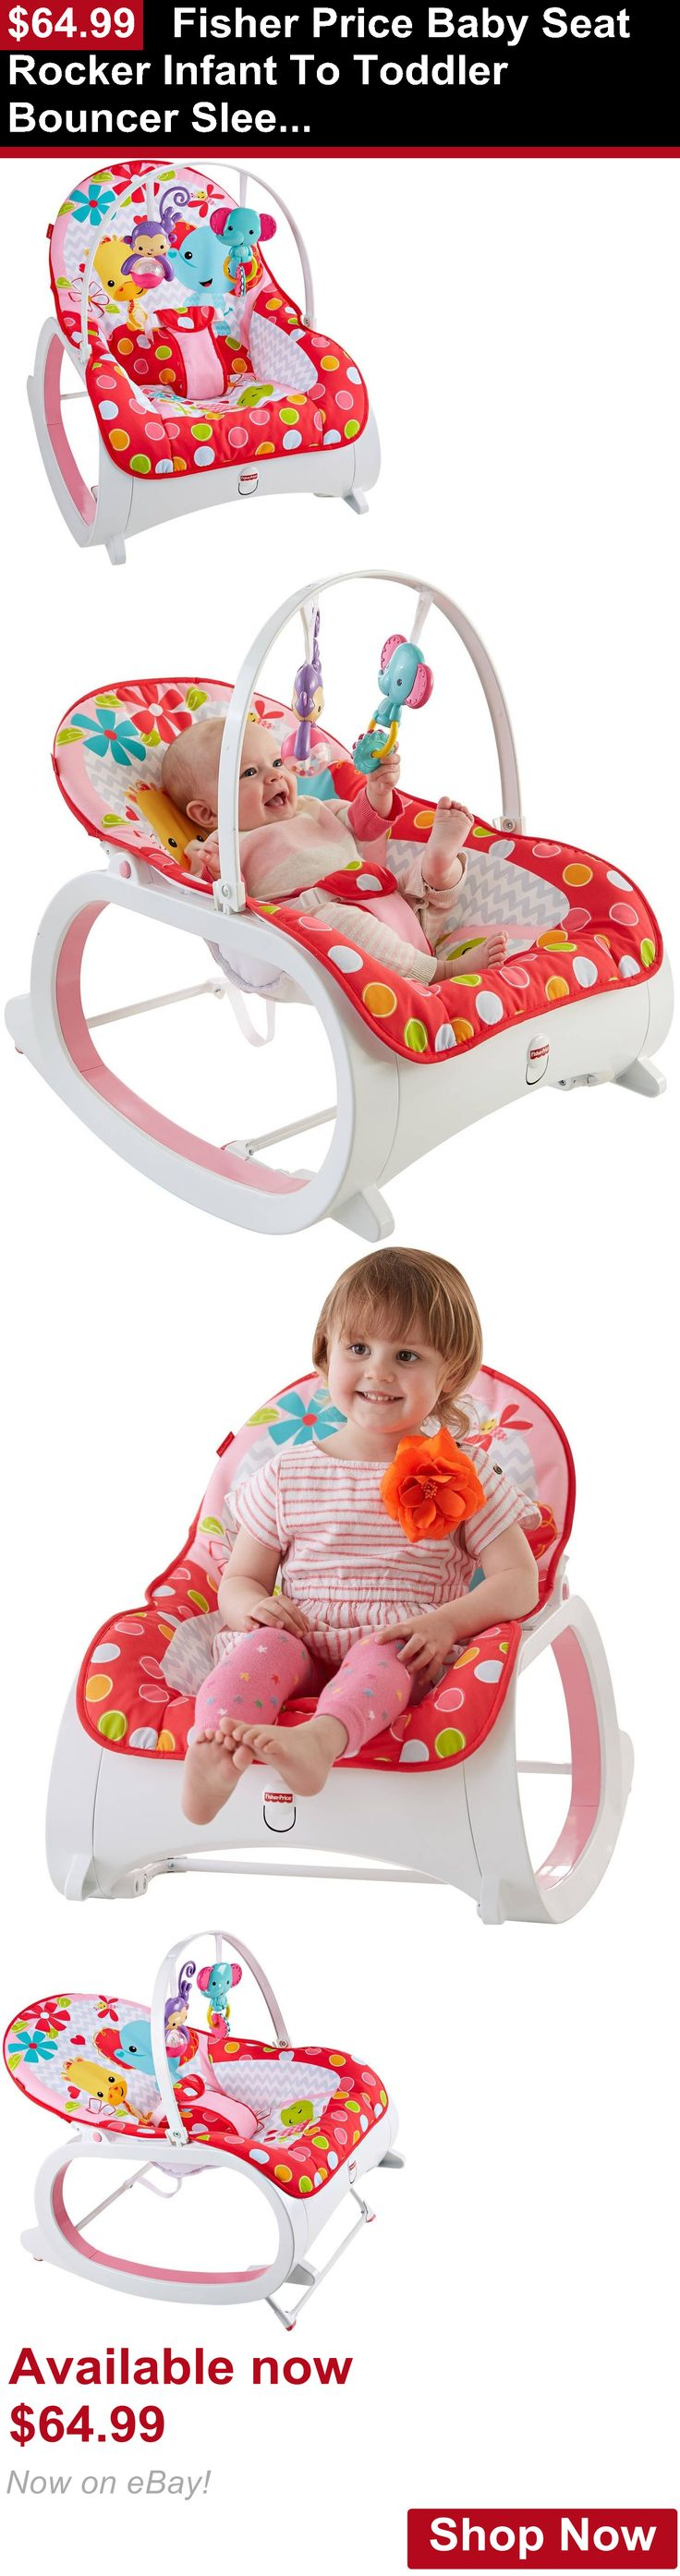 Fisher price vibrating baby bouncer amazon